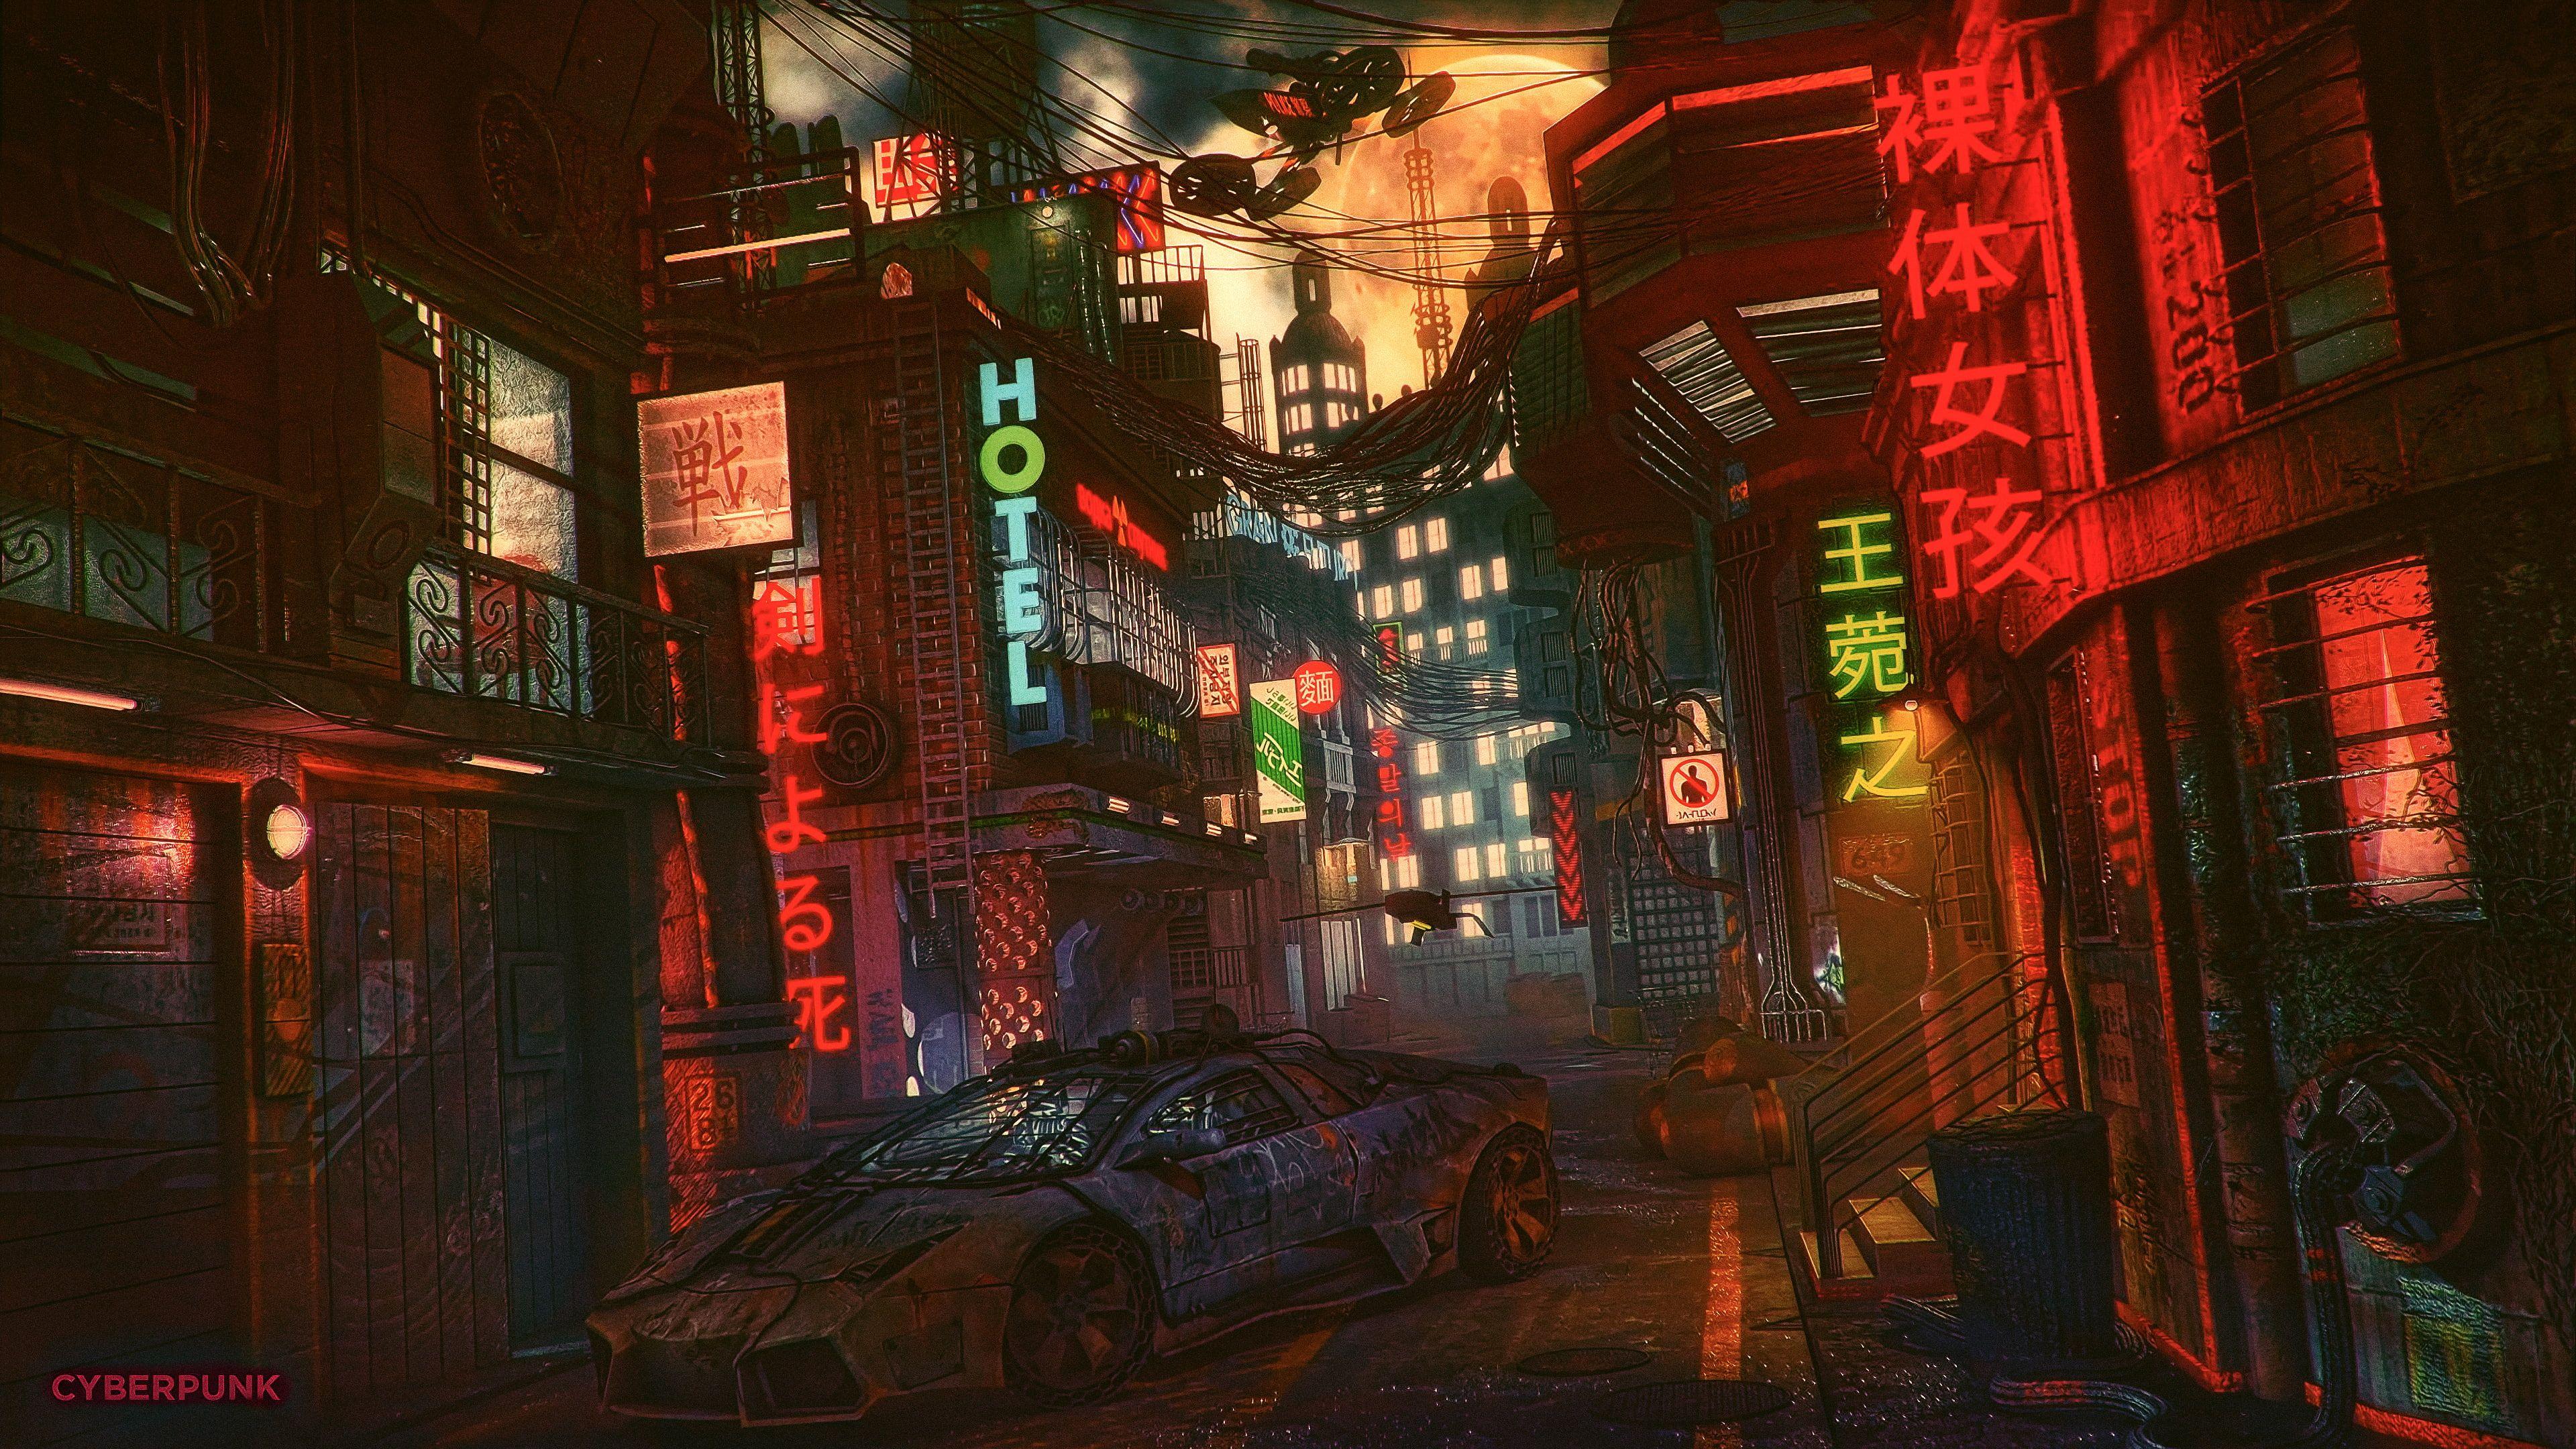 Night Artwork Futuristic City Cyberpunk Cyber Science Fiction Digital Art Concept Art Futuristic Fan Art Cgi 4k In 2020 Futuristic City Cyberpunk City Cyberpunk